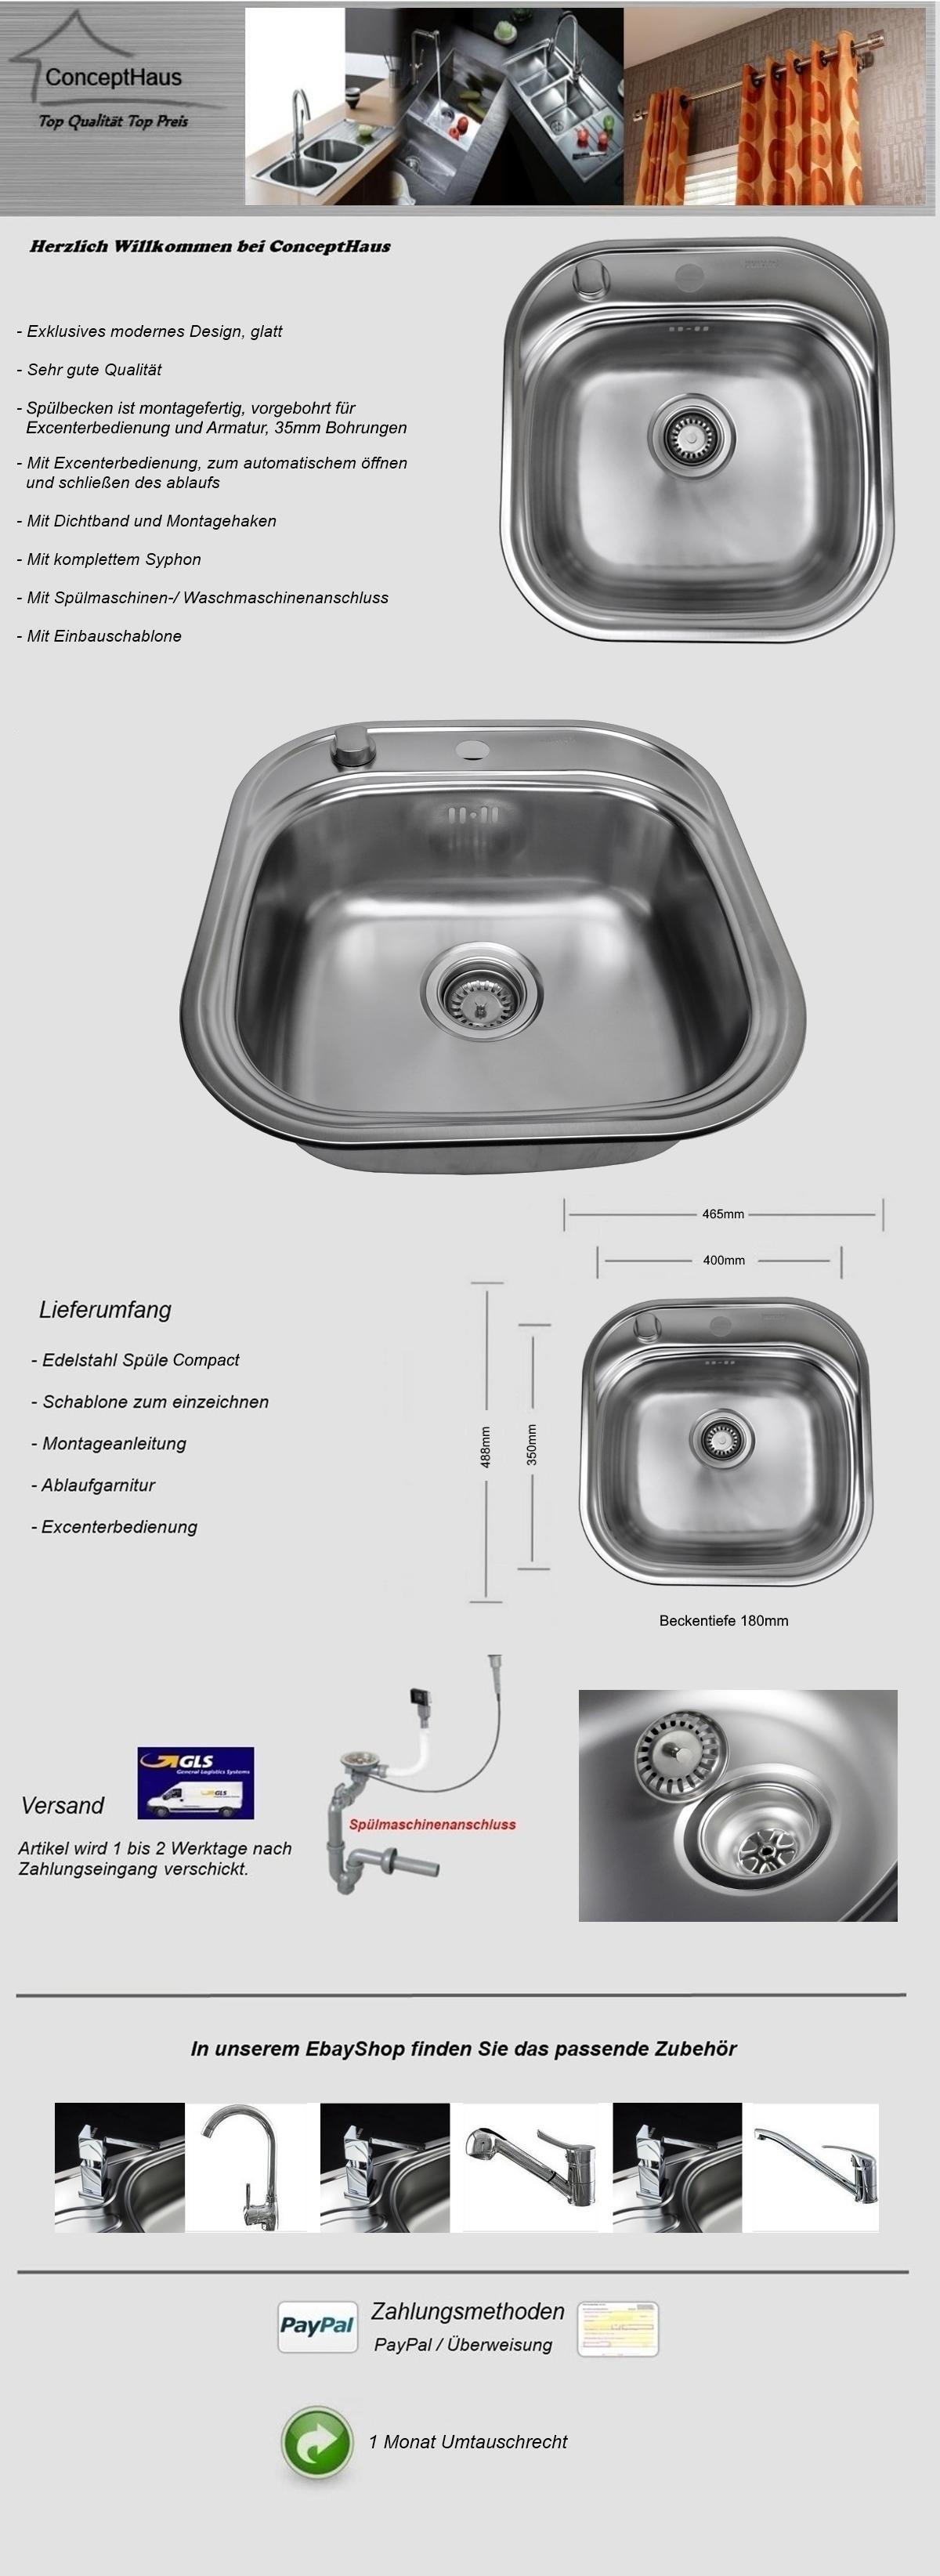 Berühmt Küchenspüle Wasserfilter Bilder - Küche Set Ideen ...